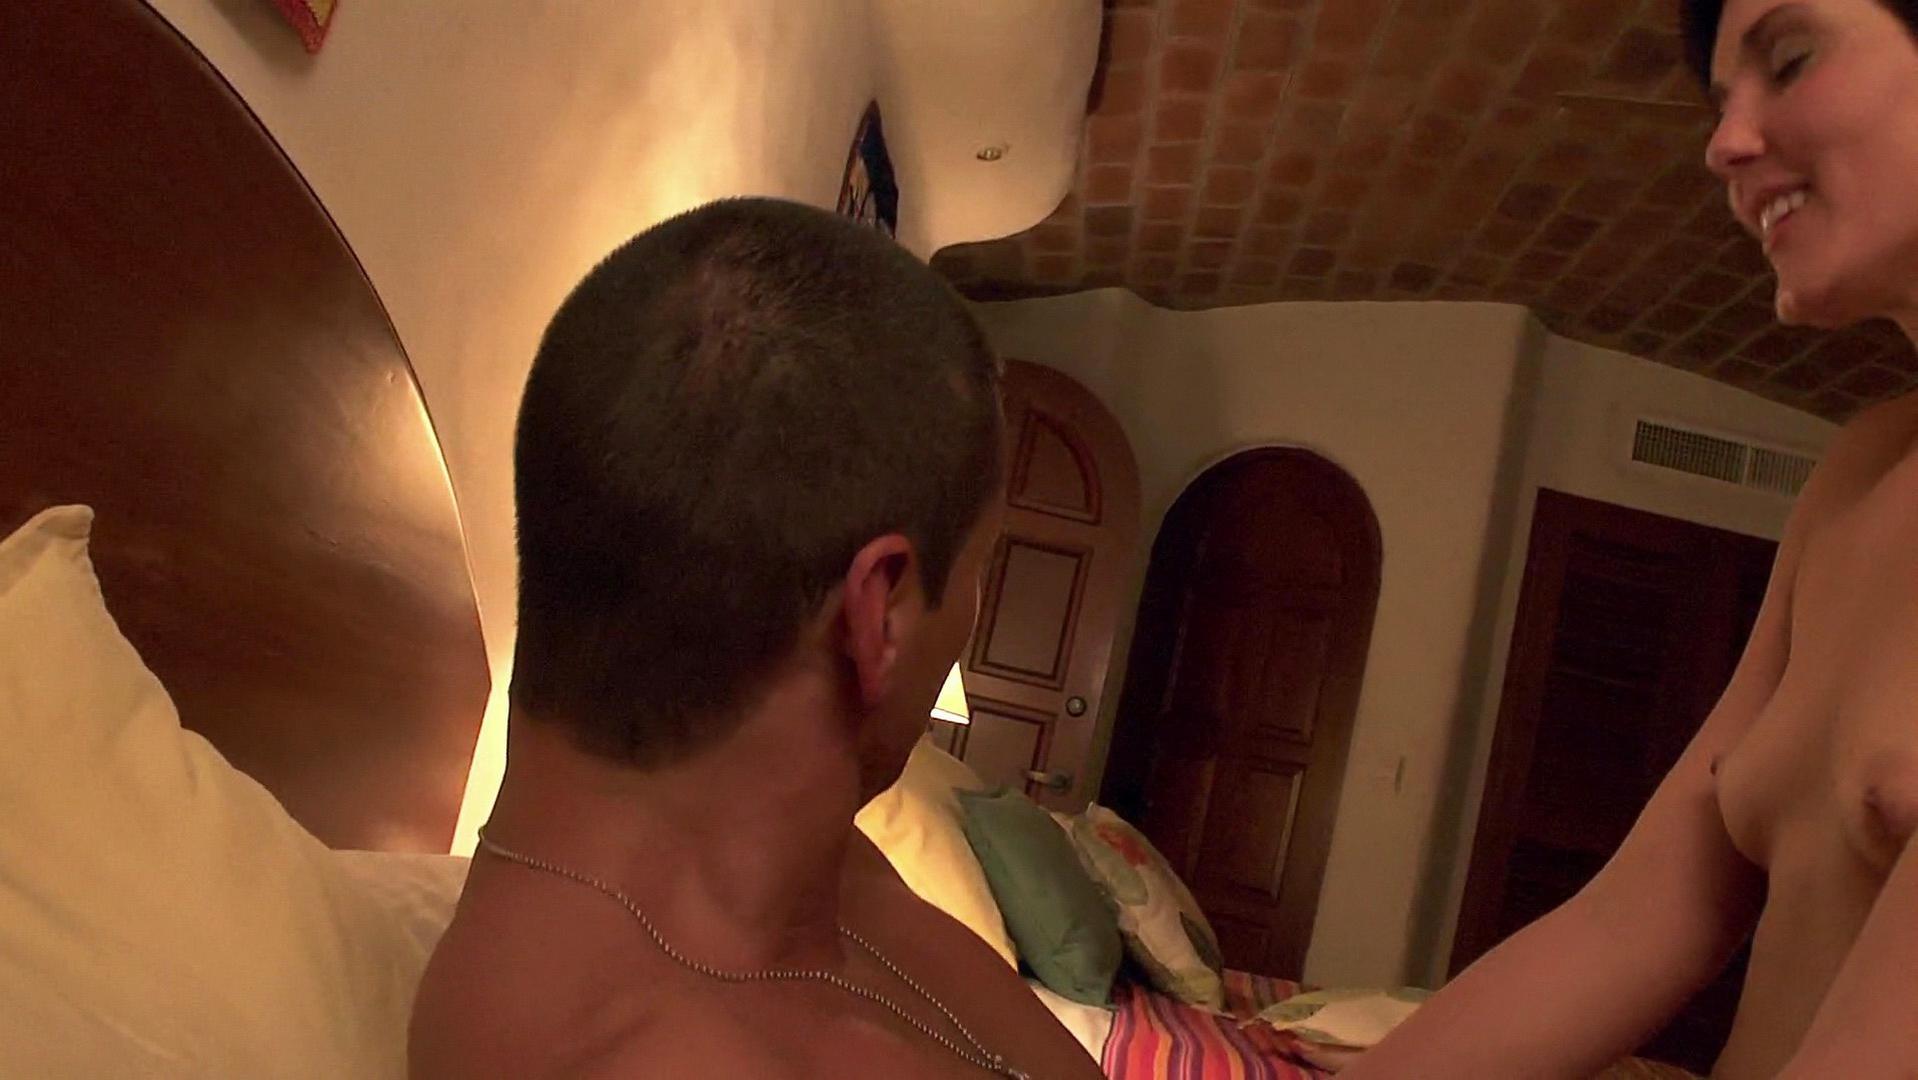 Nude Video Celebs Diana Newton Nude - Drunk Wedding 2015-8287